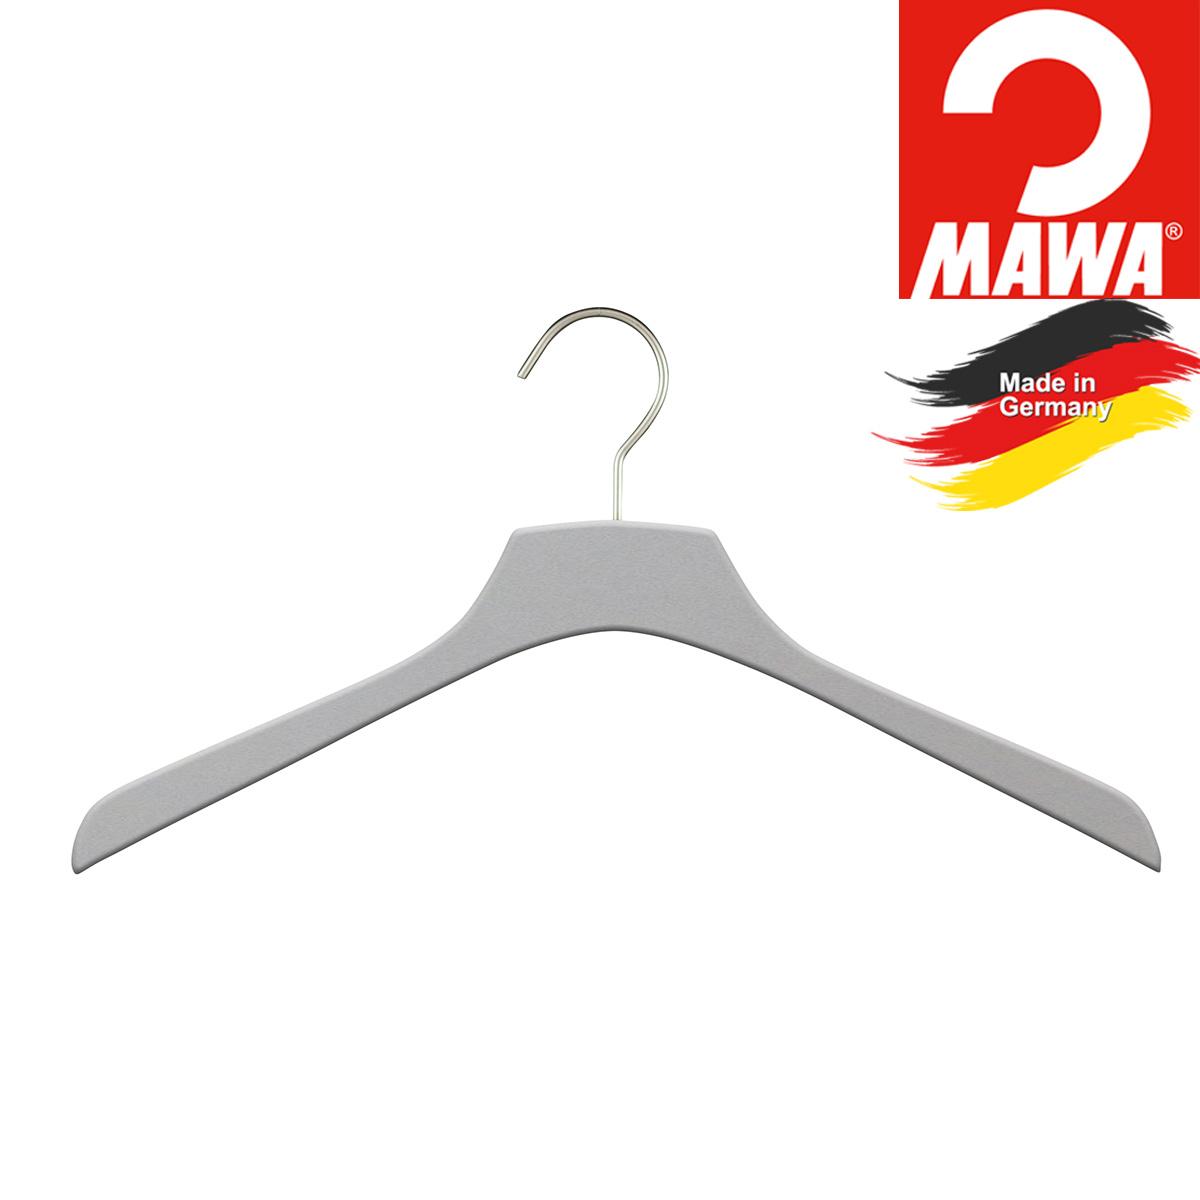 MAWA Oberteil Kleiderbügel